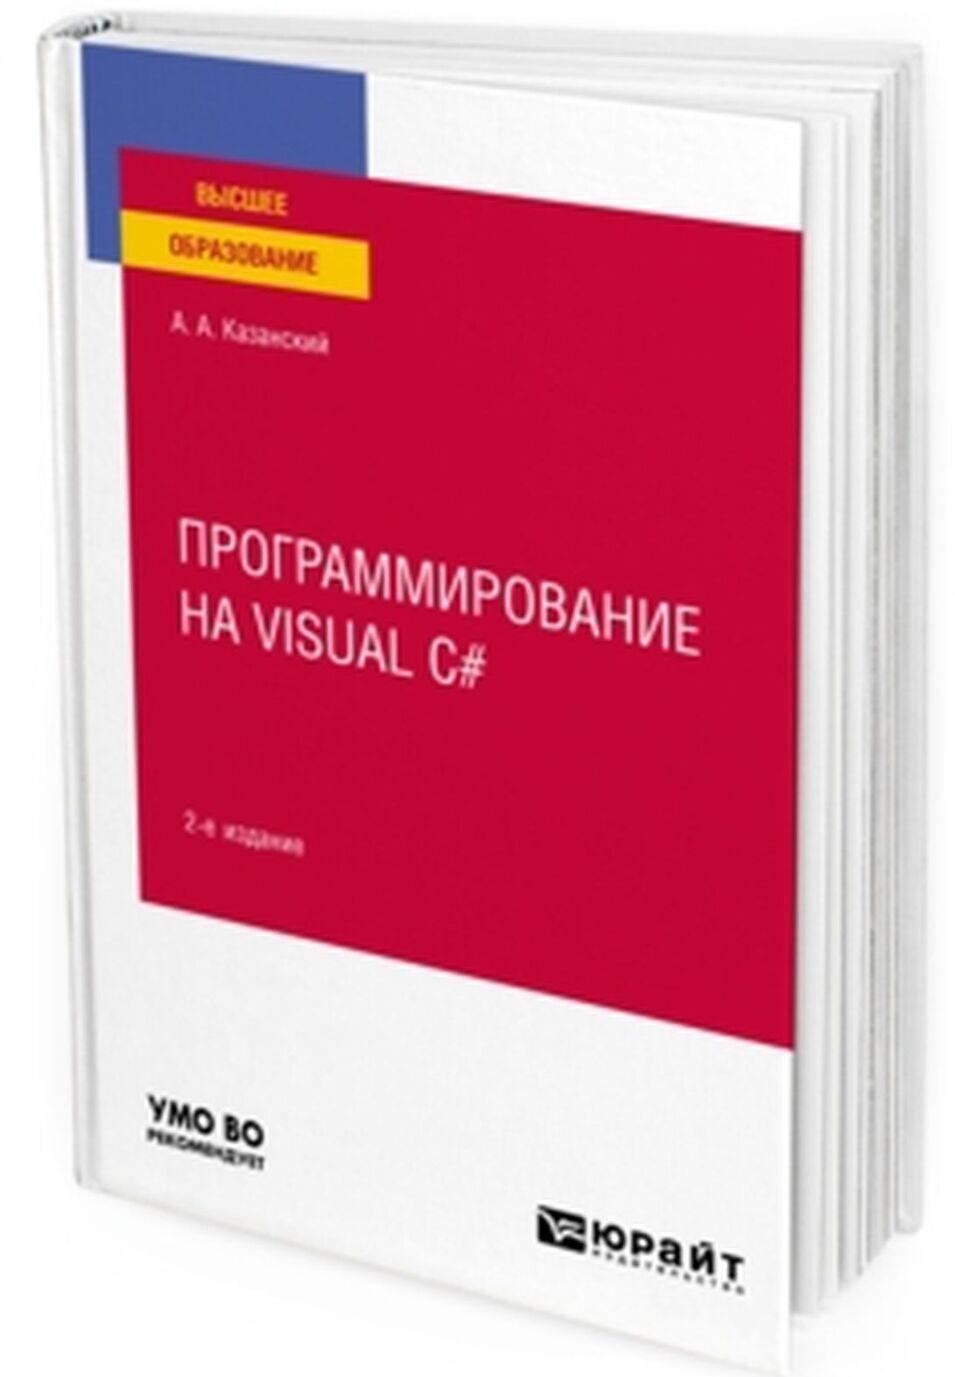 Programmirovanie na Visual C#. Uchebnoe posobie dlja vuzov